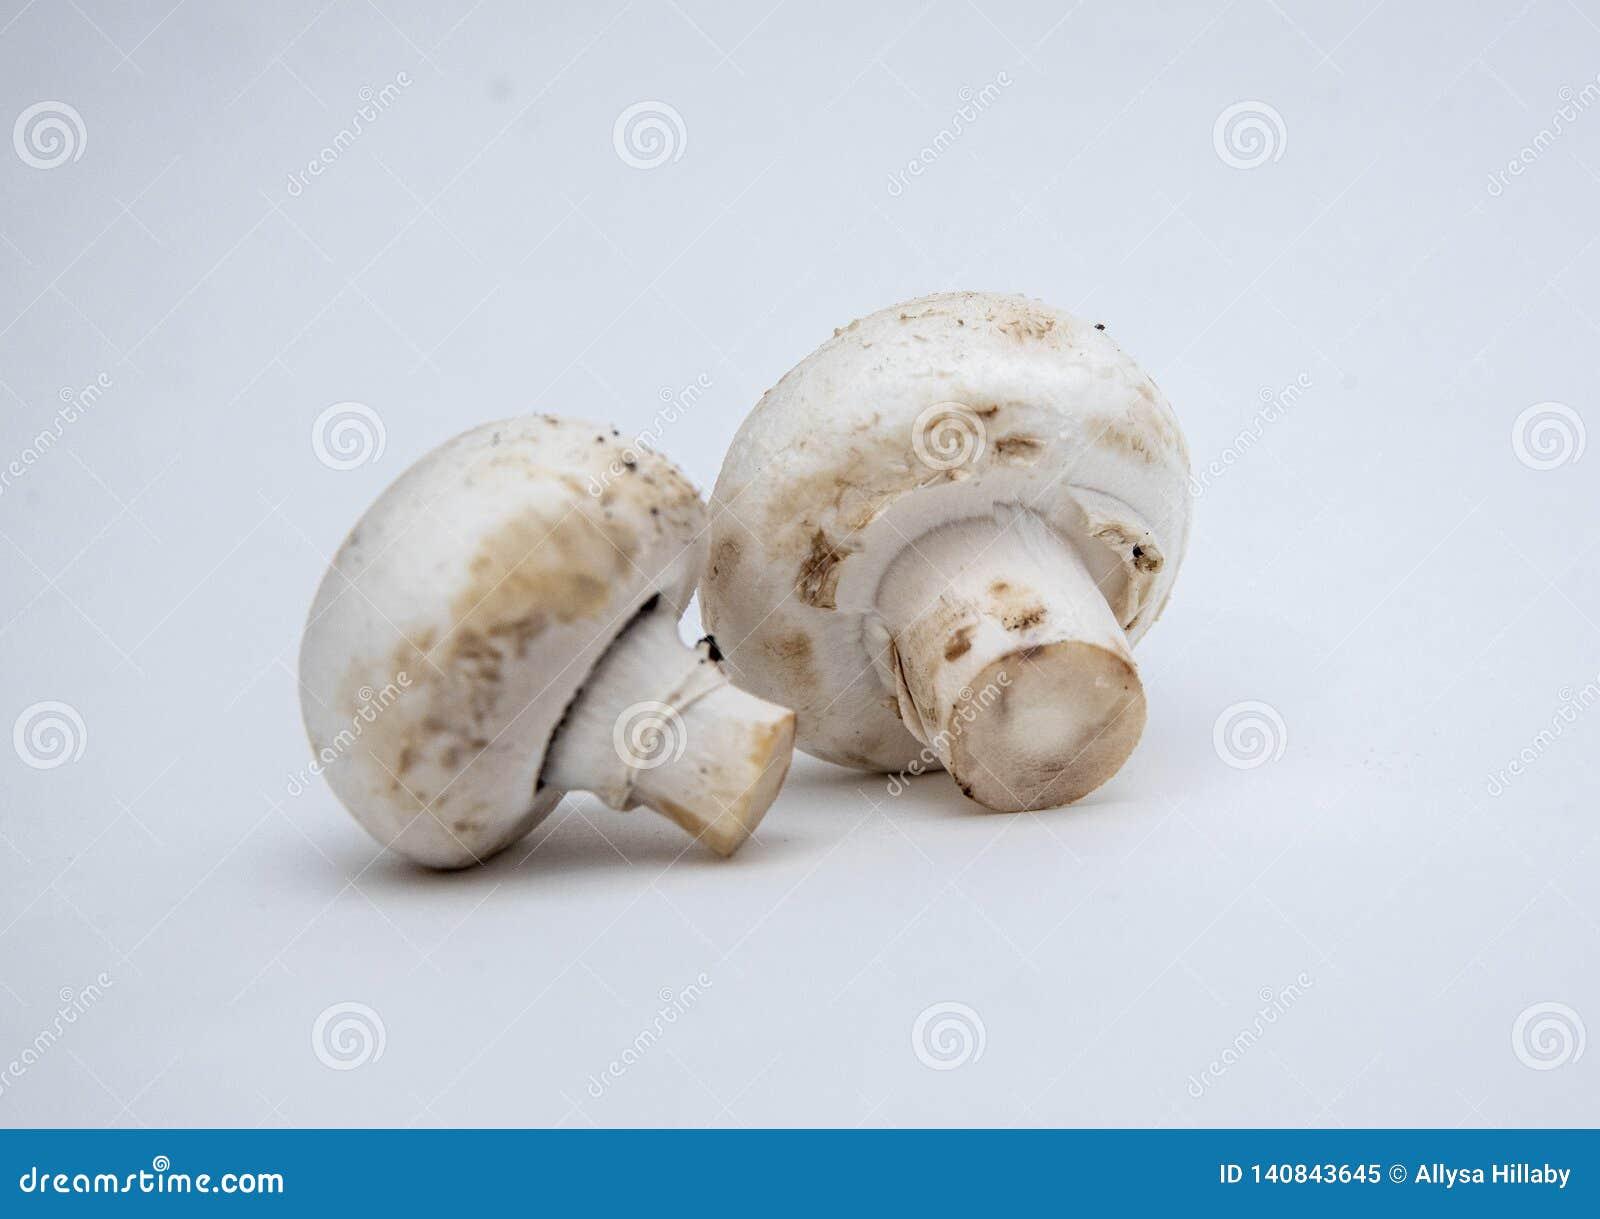 Mushrooms white backdrop